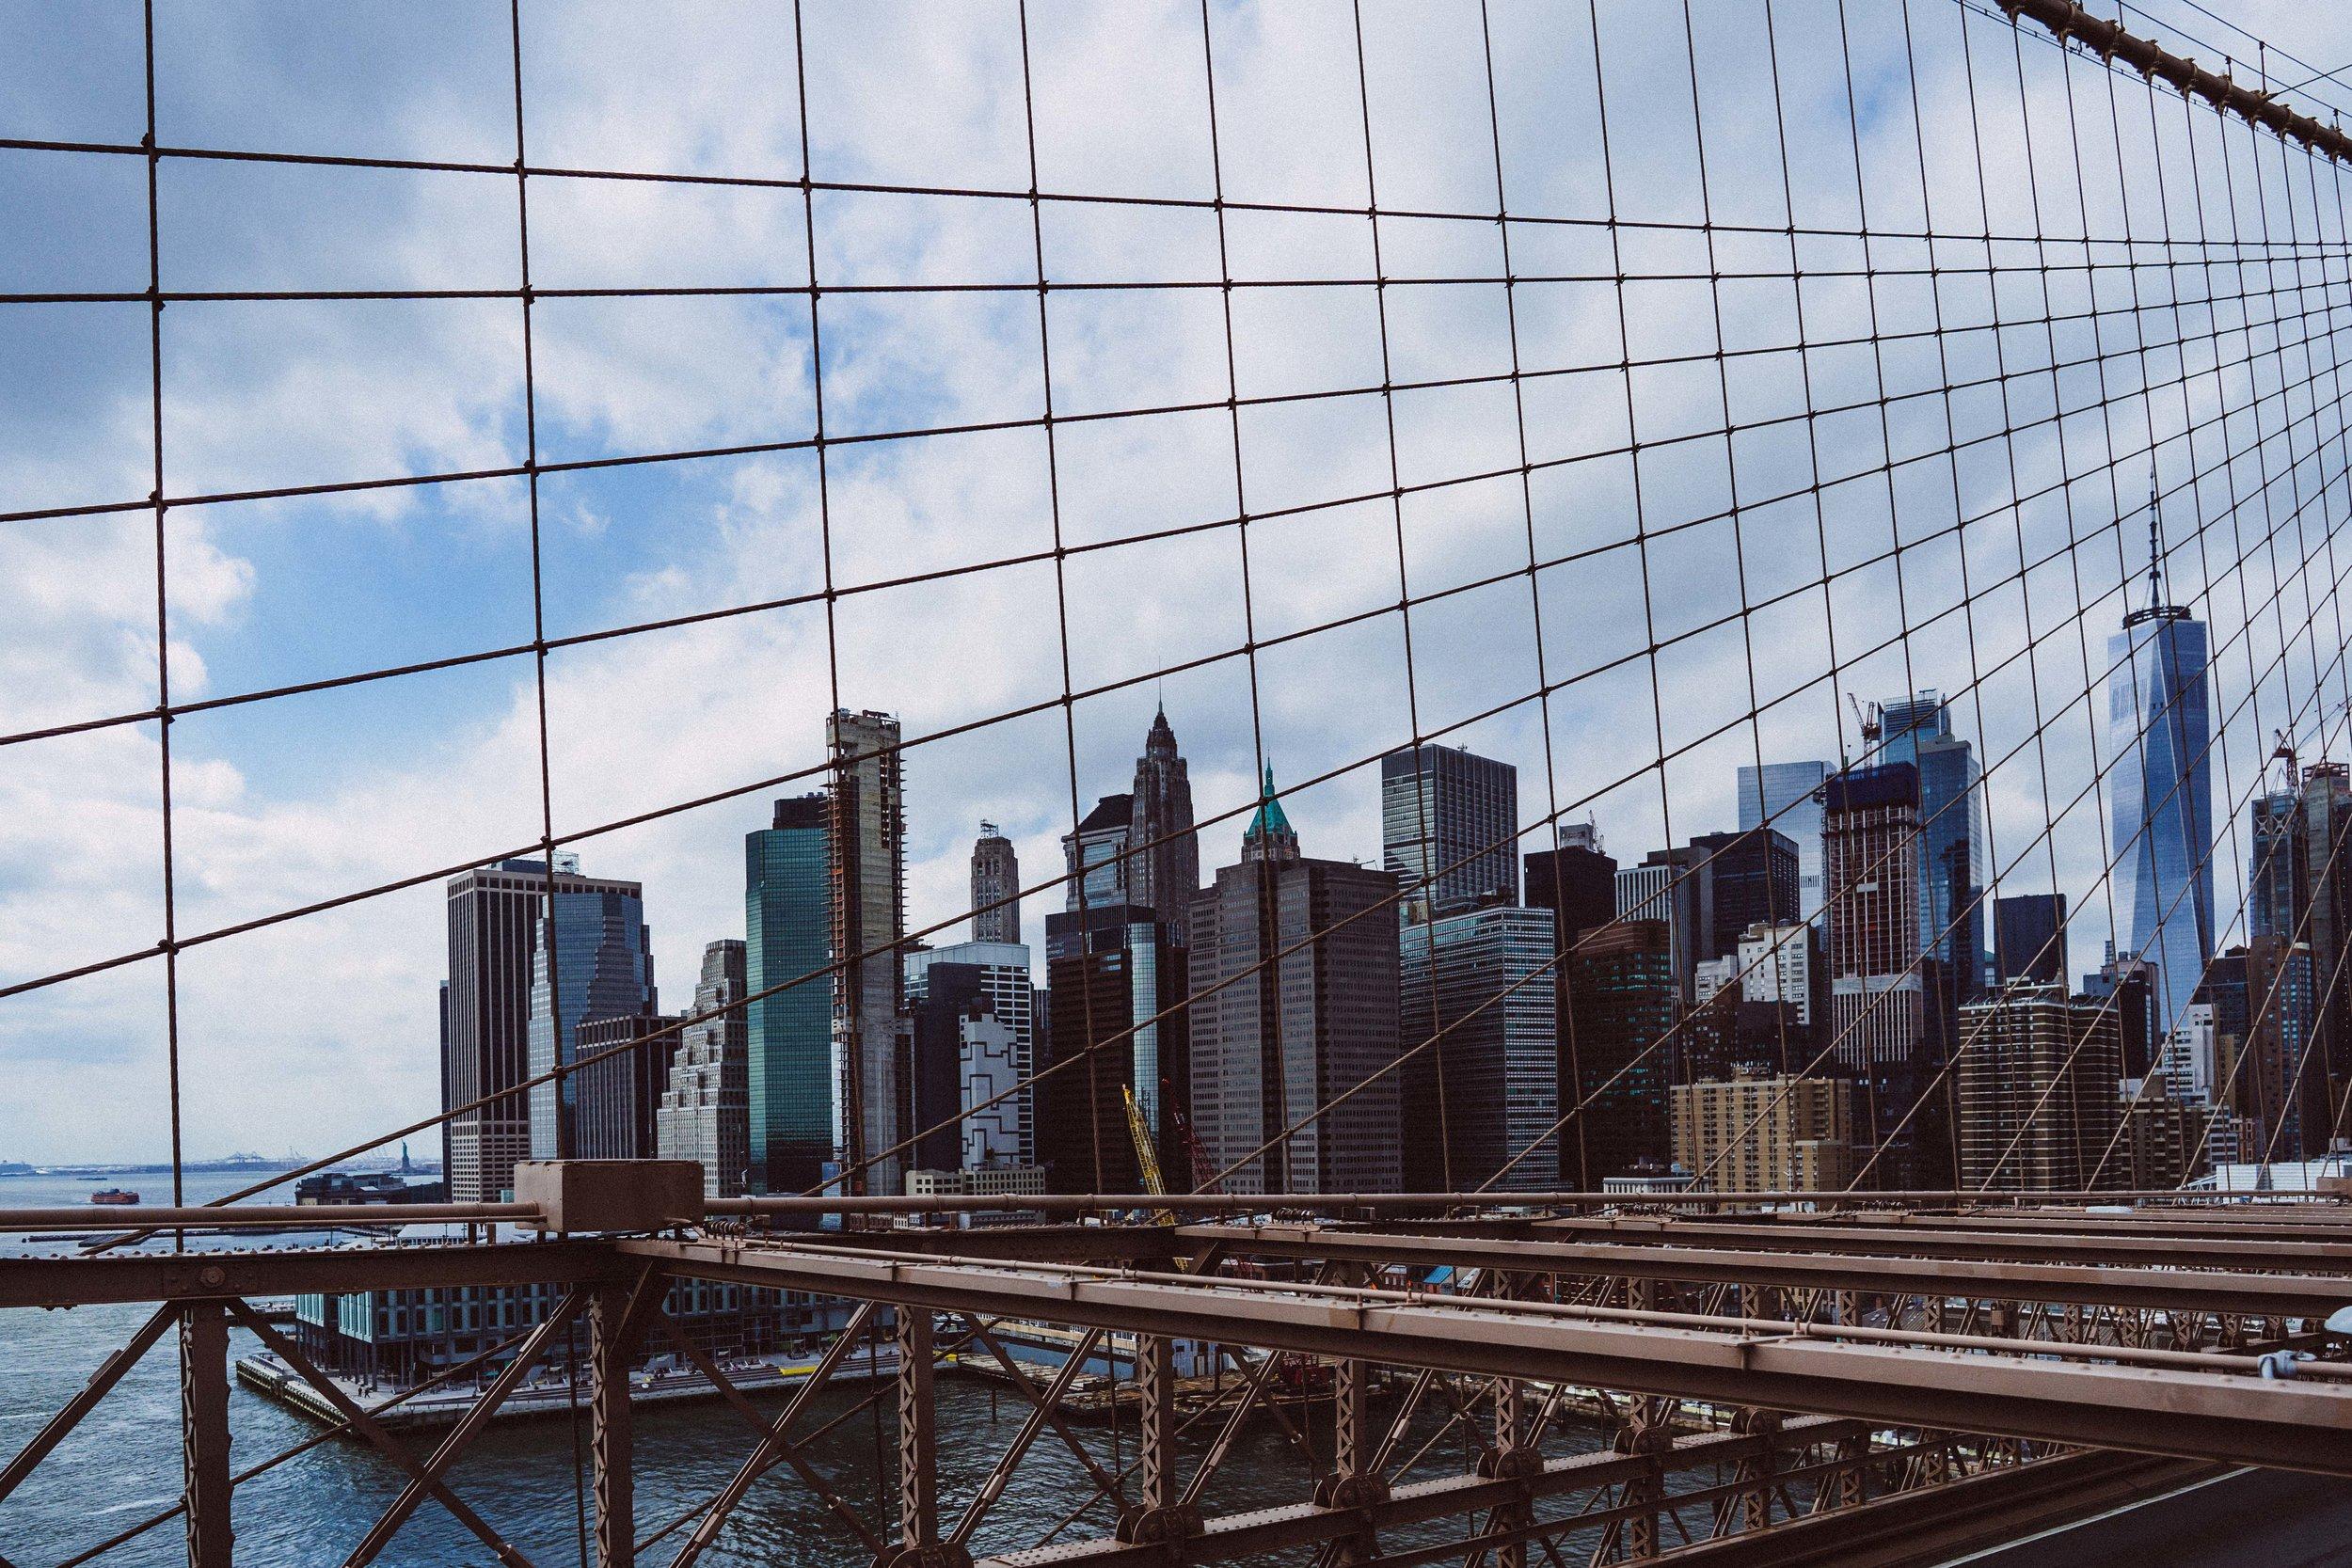 newyork-sony-102266.jpg